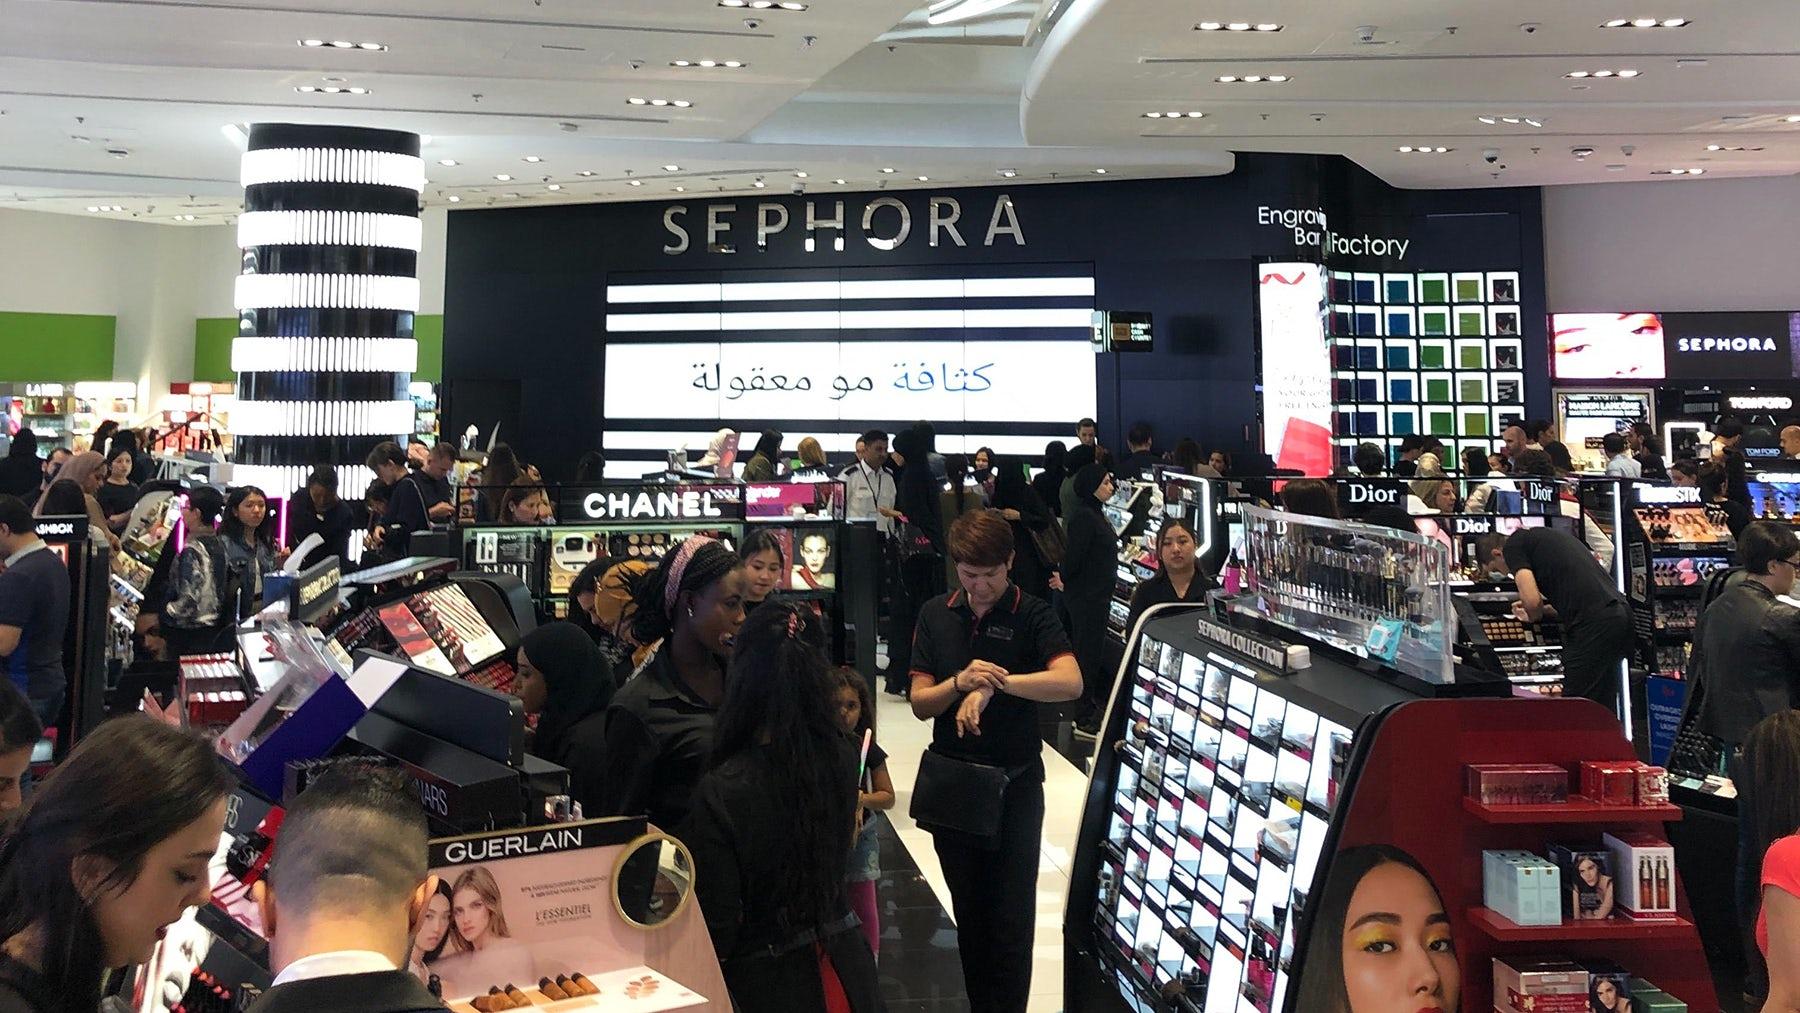 Sephora at the Dubai Mall | Photo by Rachel Strugatz